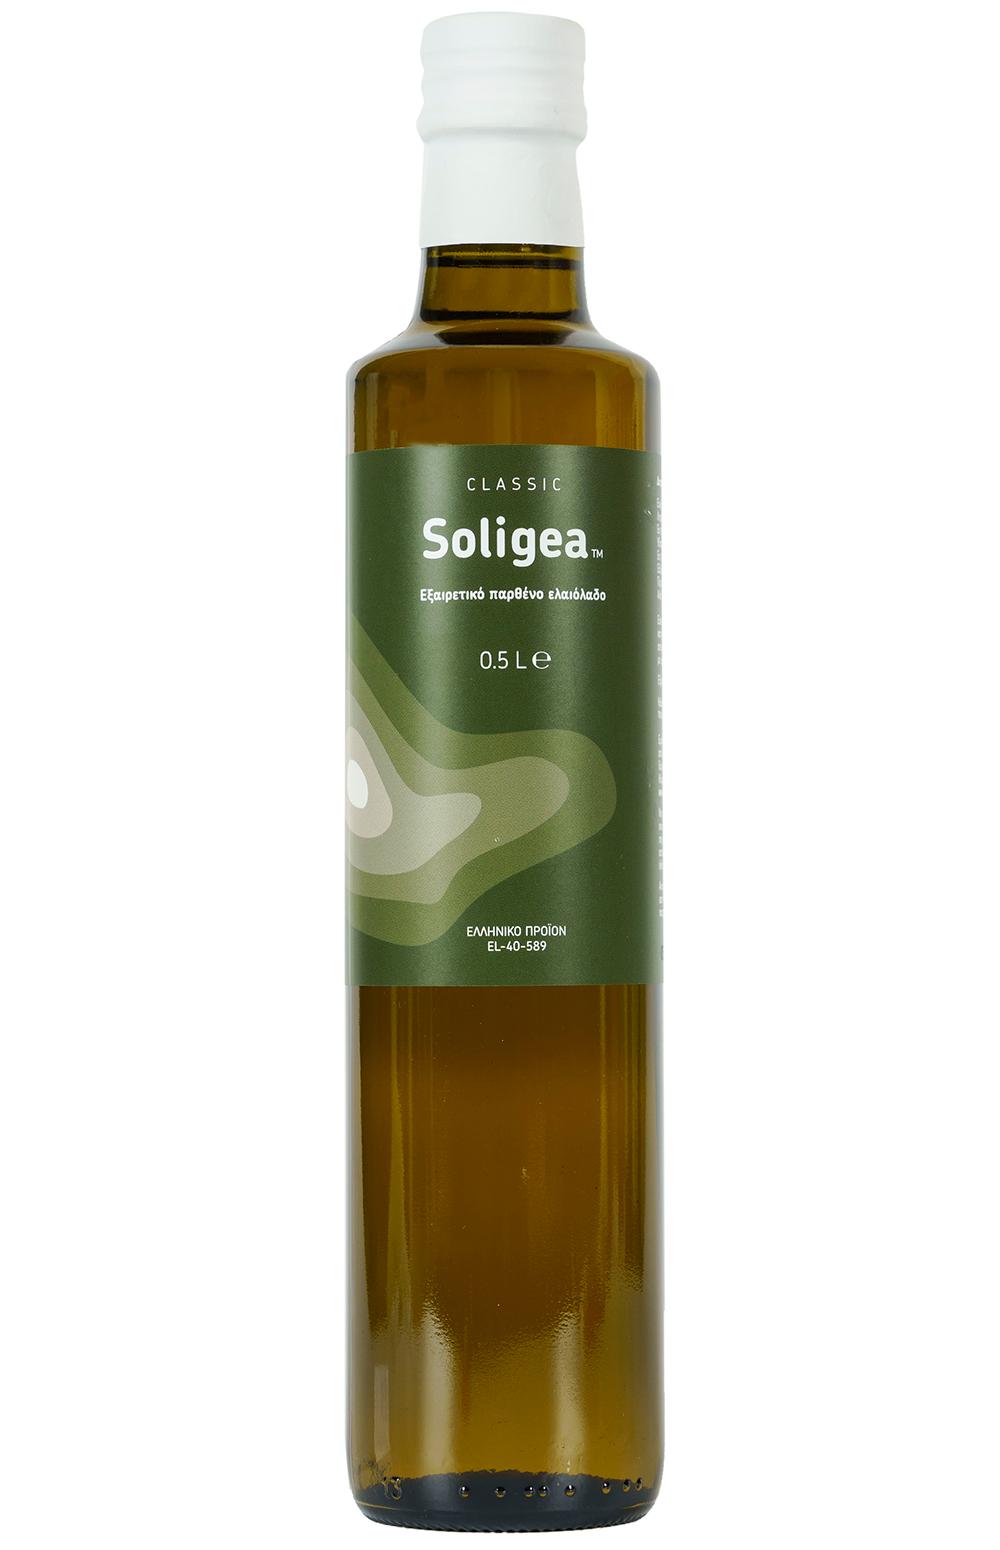 Soligea Classic